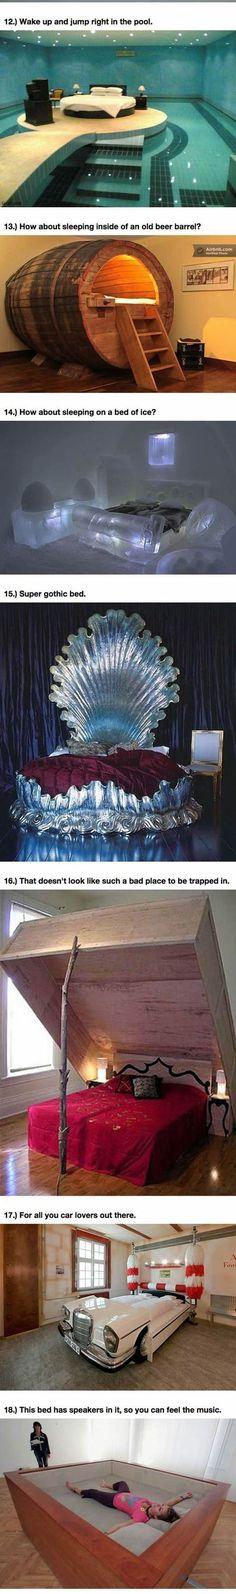 Beds interior design ideas